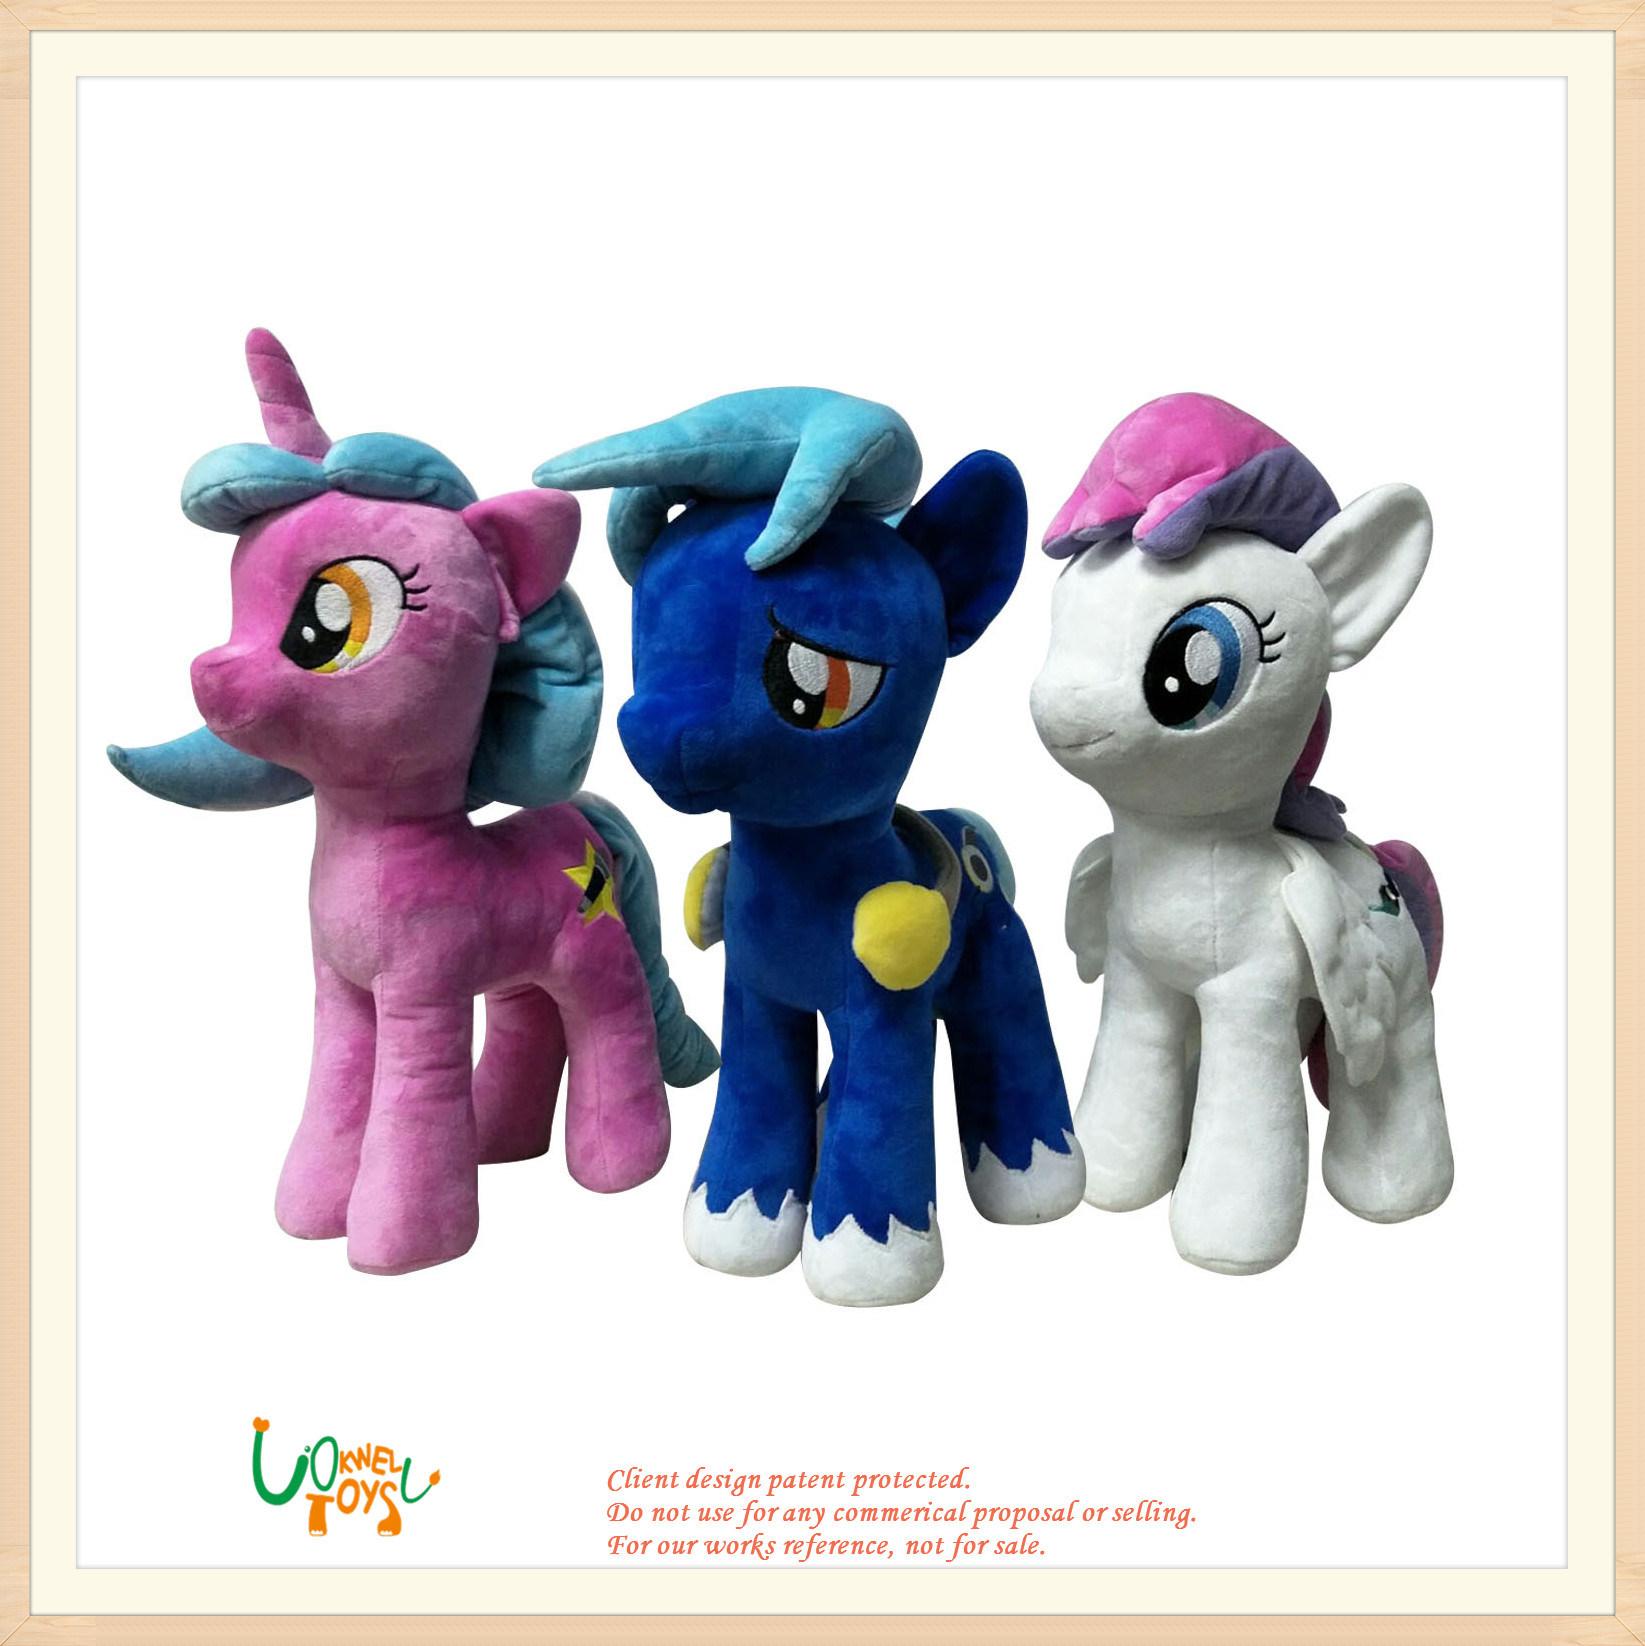 de3c178e7d5 Plush Toy Child Price